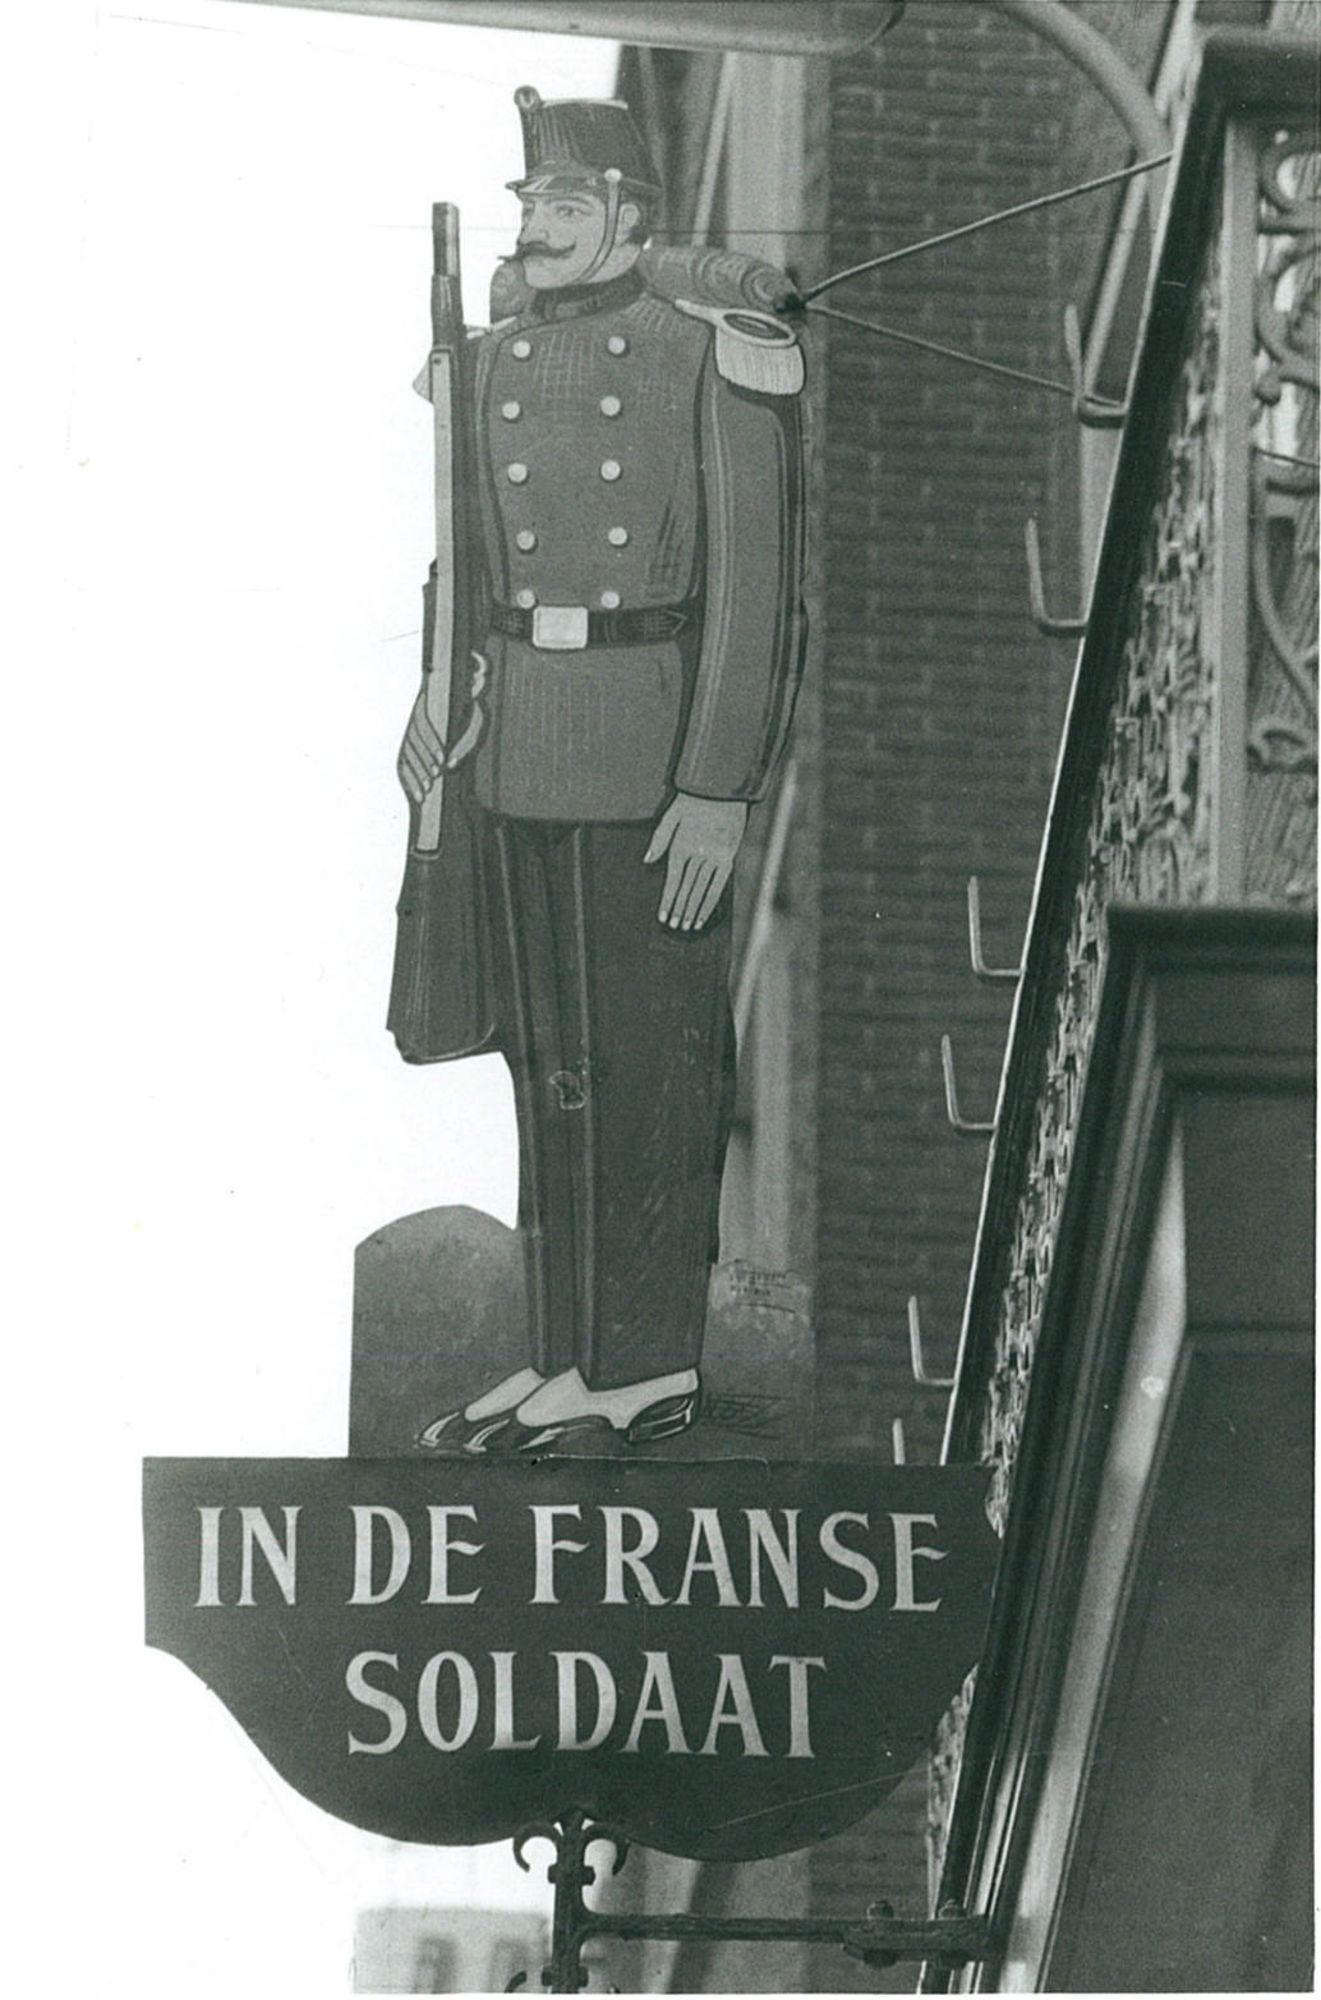 Café In de Franse soldaat